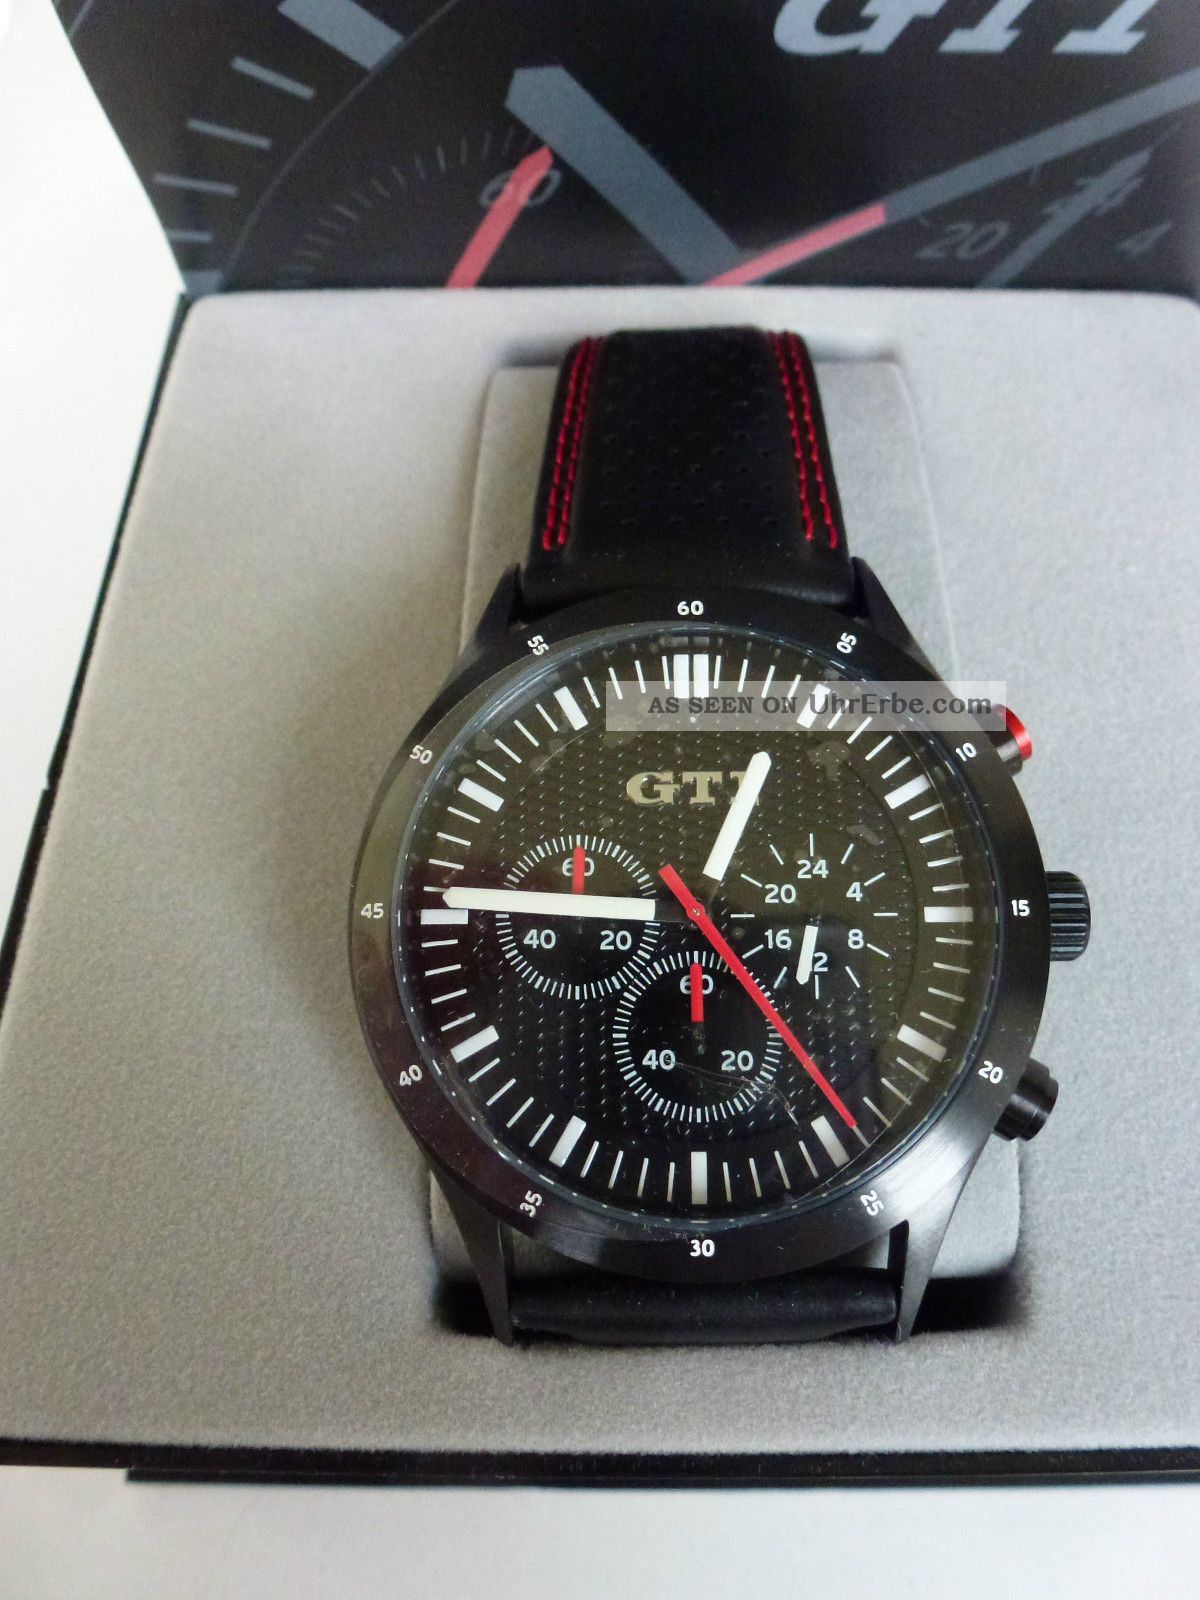 Gti Uhr Chronograph Seiko Vd54 / Armbanduhren Bild